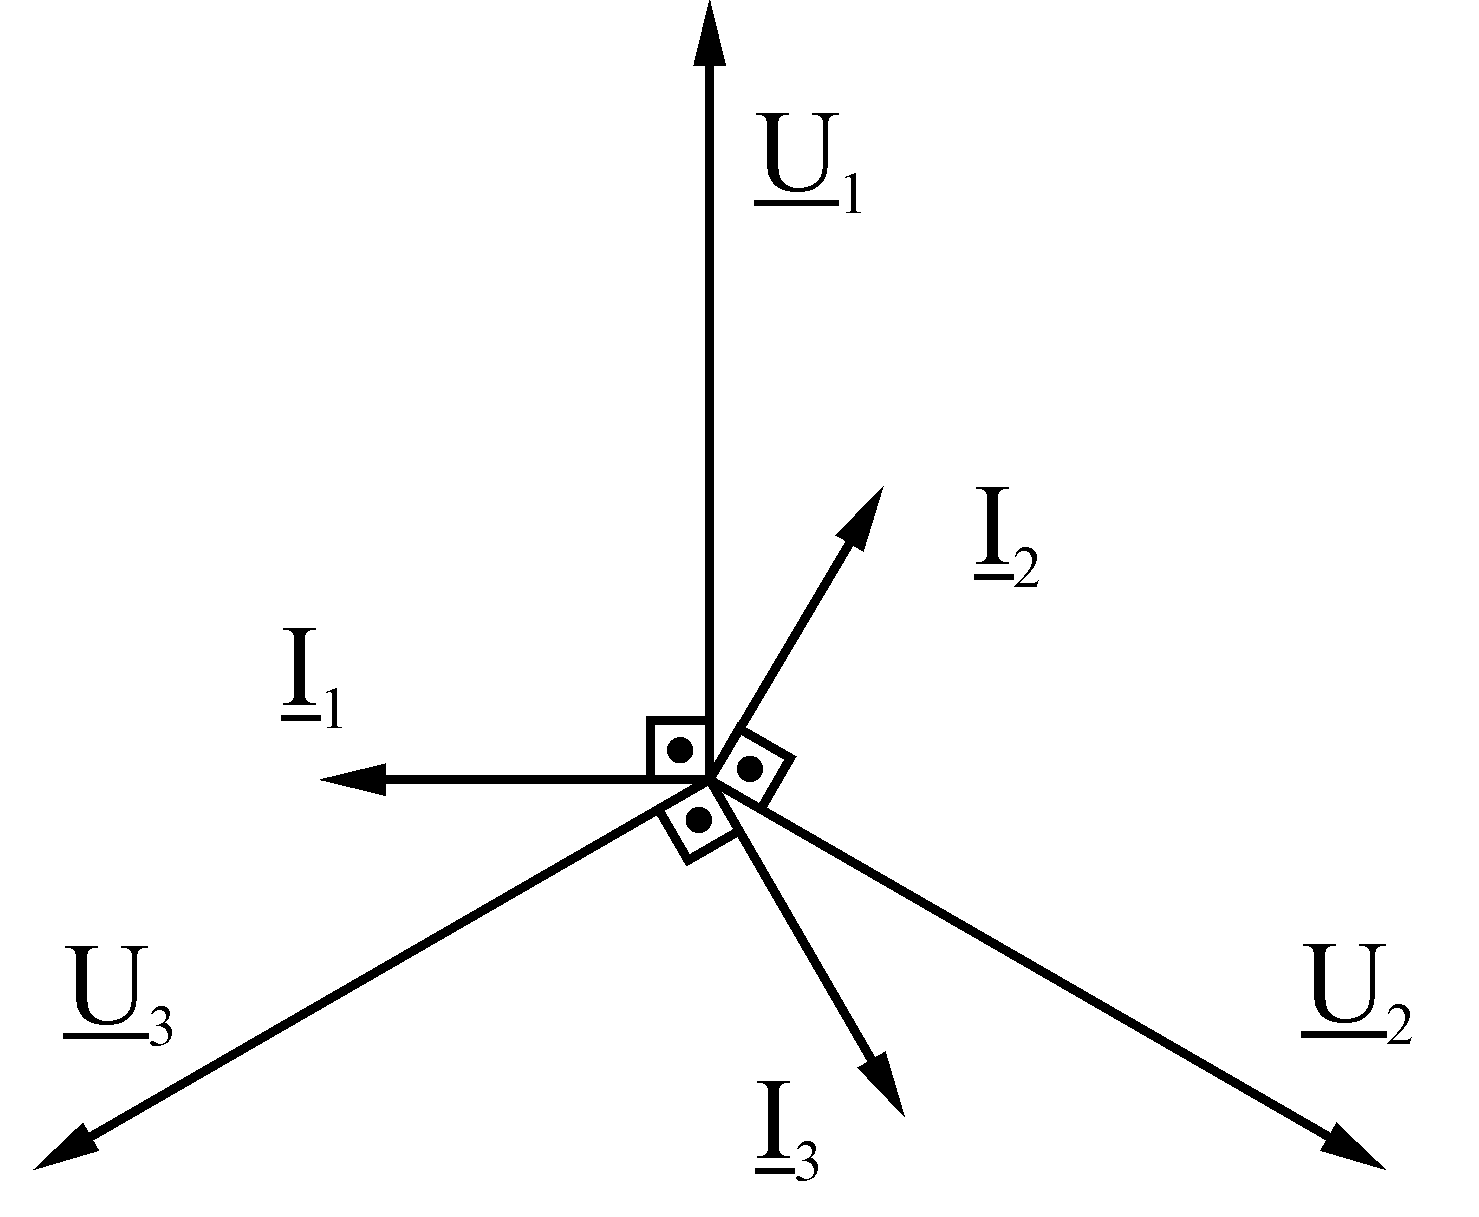 7-17_1_1